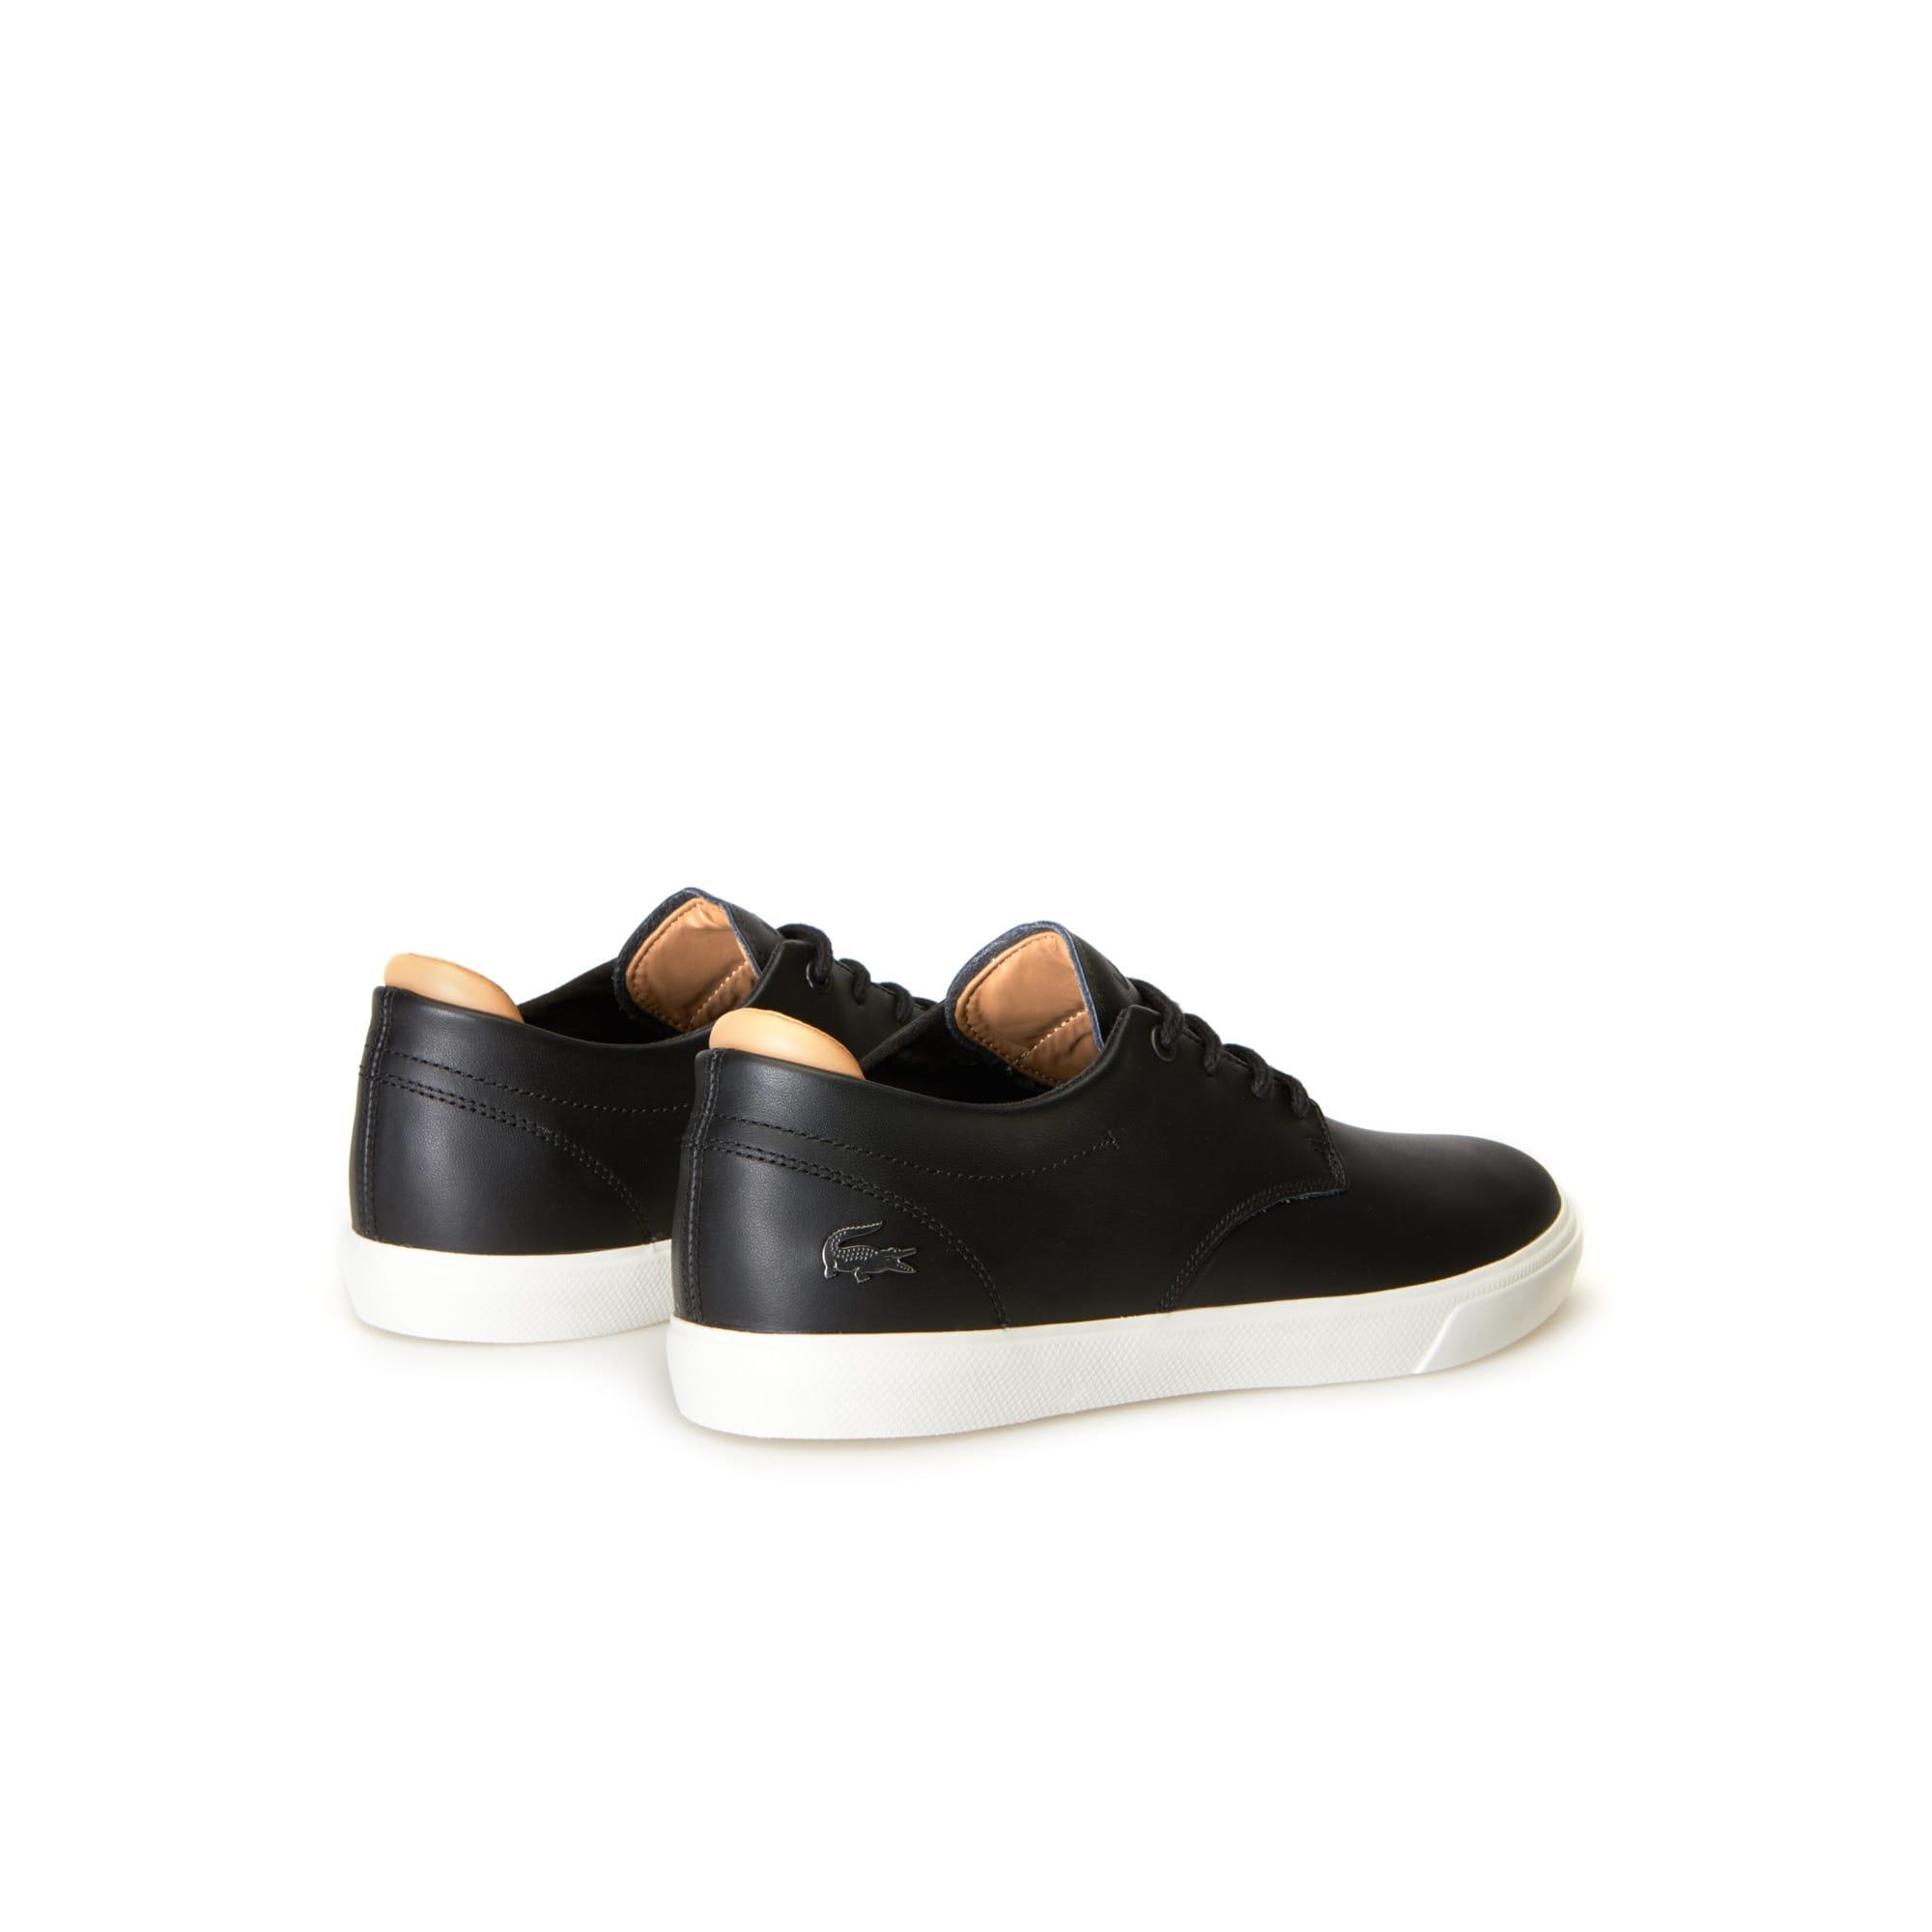 Espere Nappa Leather Sneakers   LACOSTE